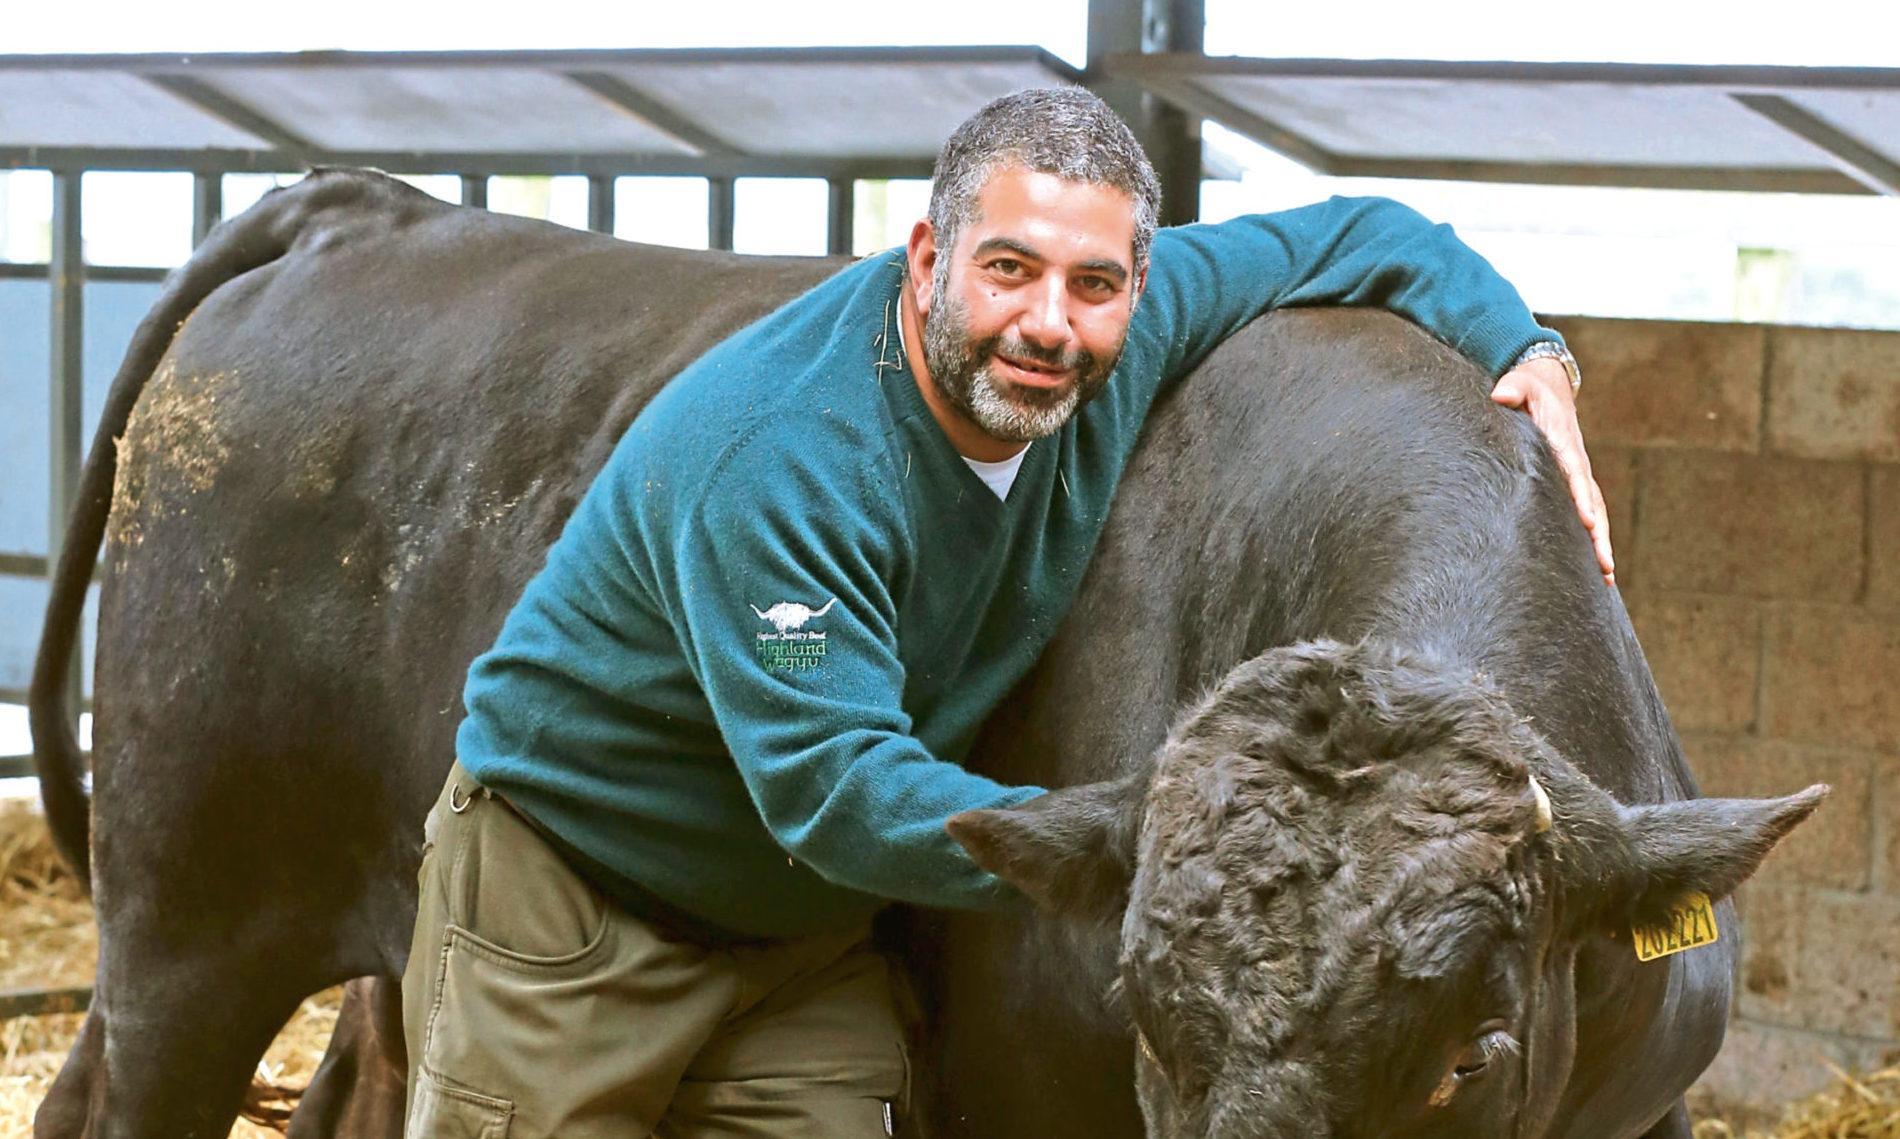 Mohsin Al-Tajir with Thor the bull, in Blackford, Scotland.